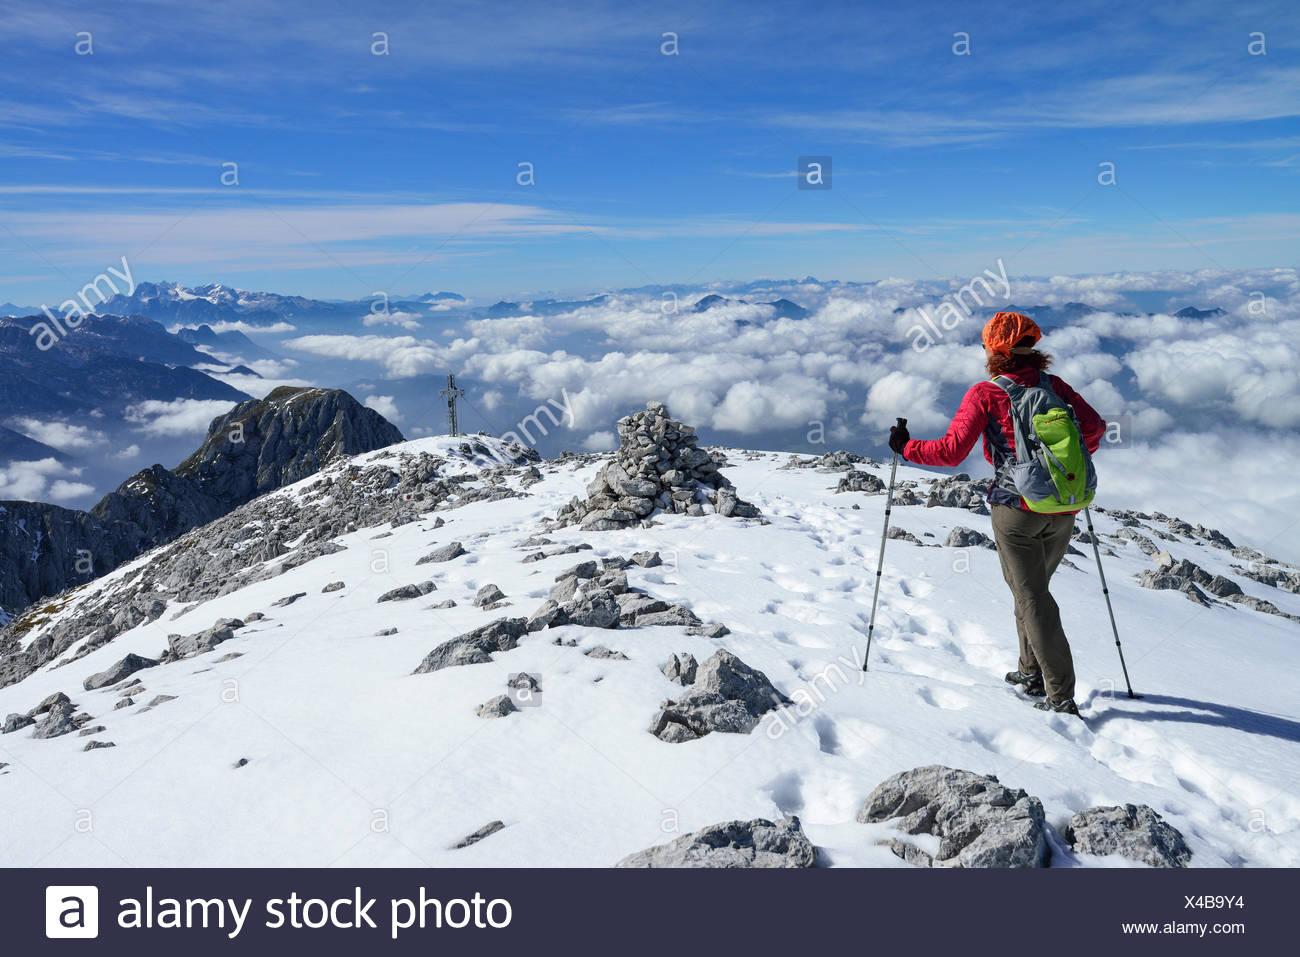 Woman descending from Hoher Goell, Dachstein range in background, Berchtesgaden National Park, Berchtesgaden Alps, Upper Bavaria, Bavaria, Germany Stock Photo